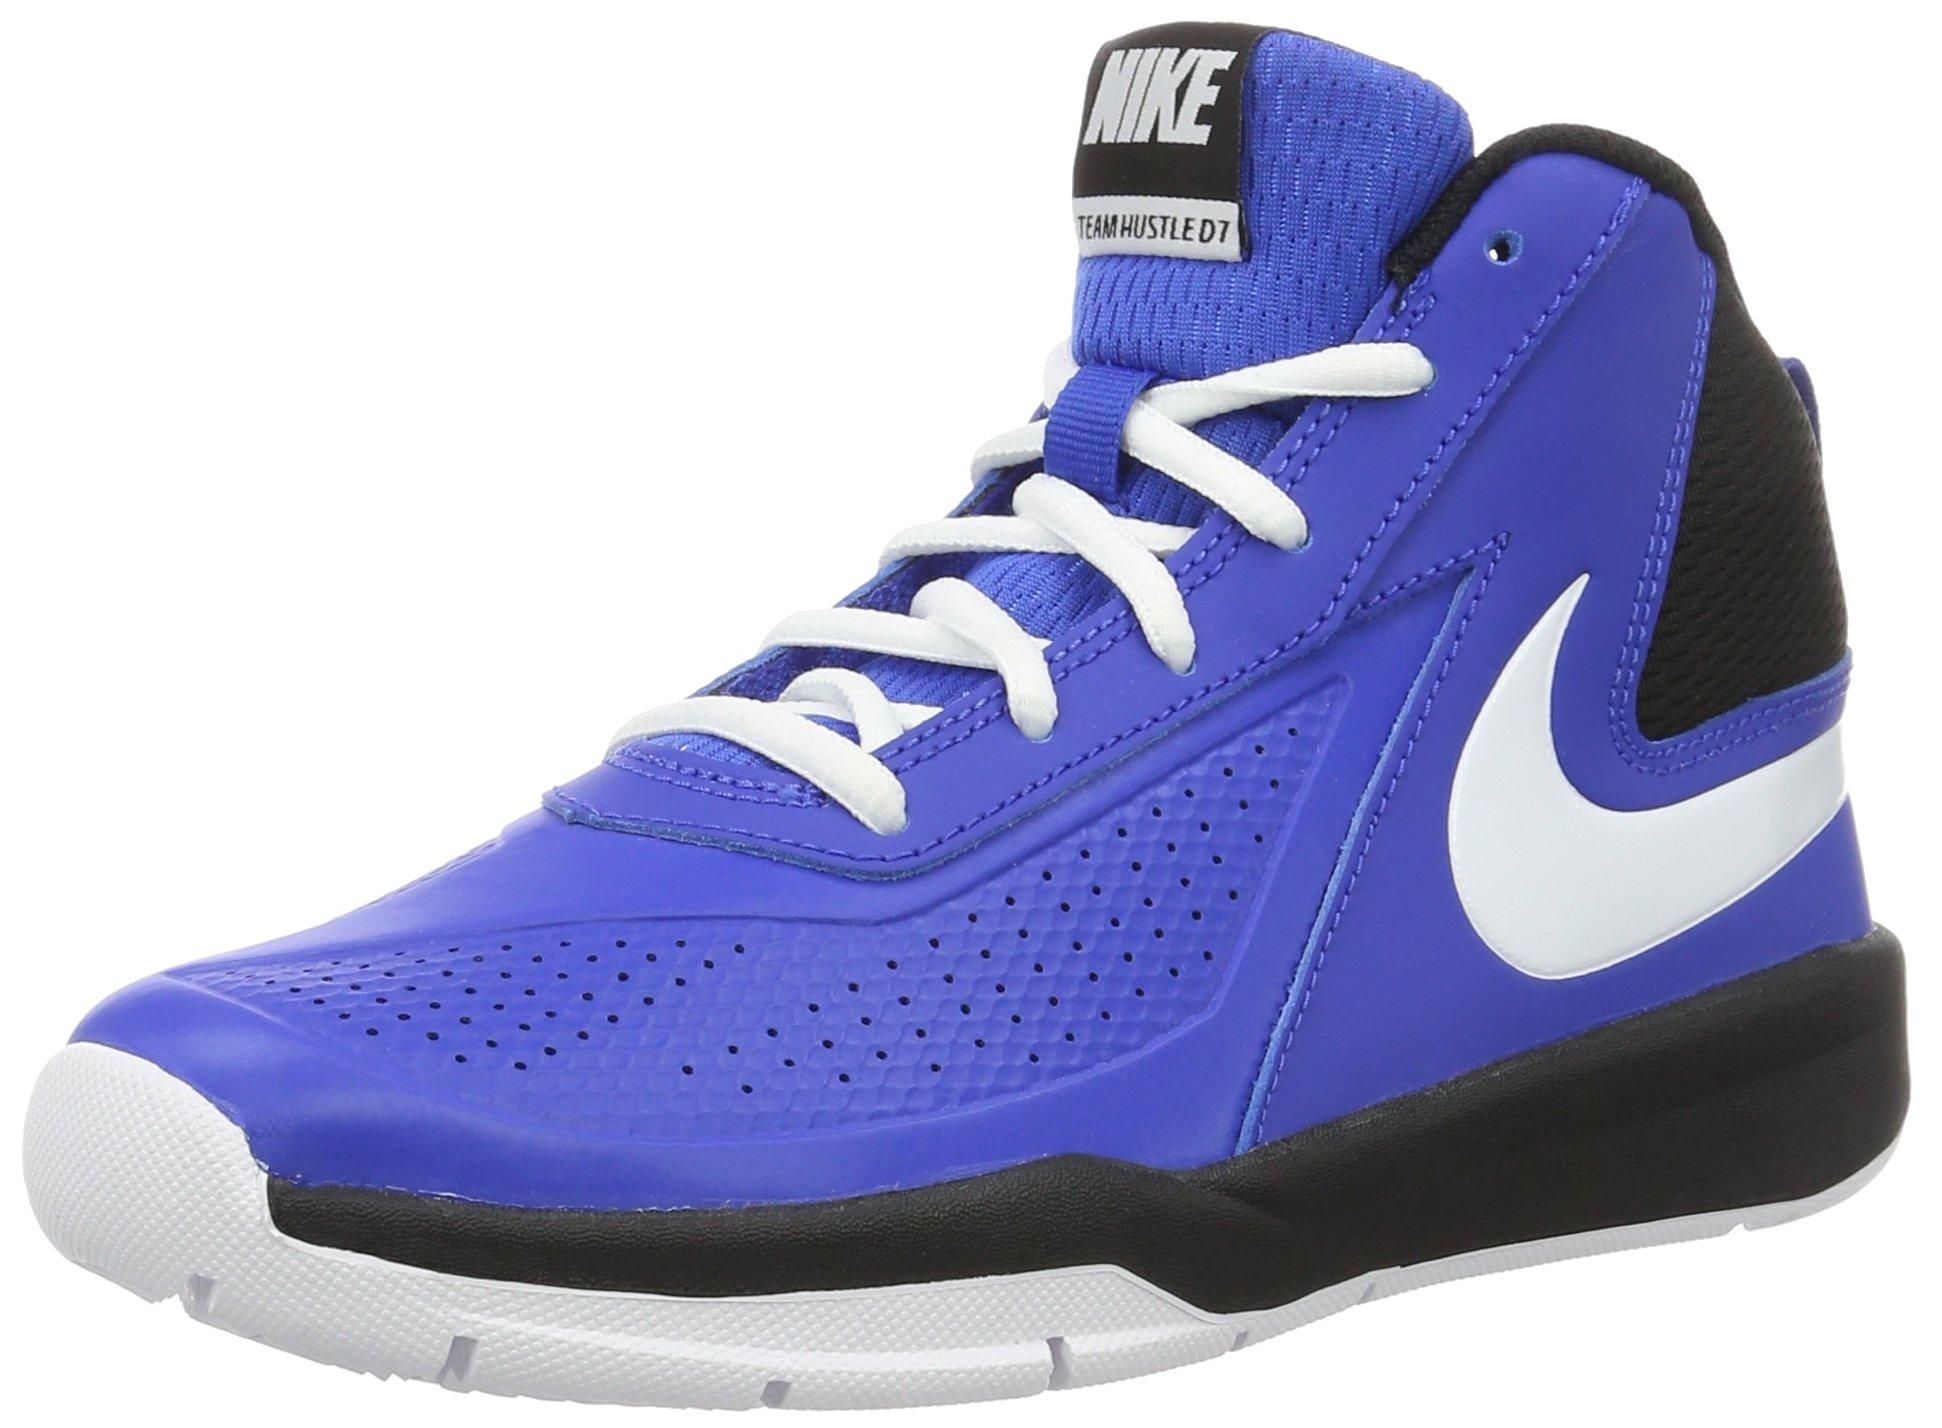 8aedbac5bf Galleon - Nike Boy's Team Hustle D 7 Basketball Shoe Game Royal/White/Black  Size 5 M US